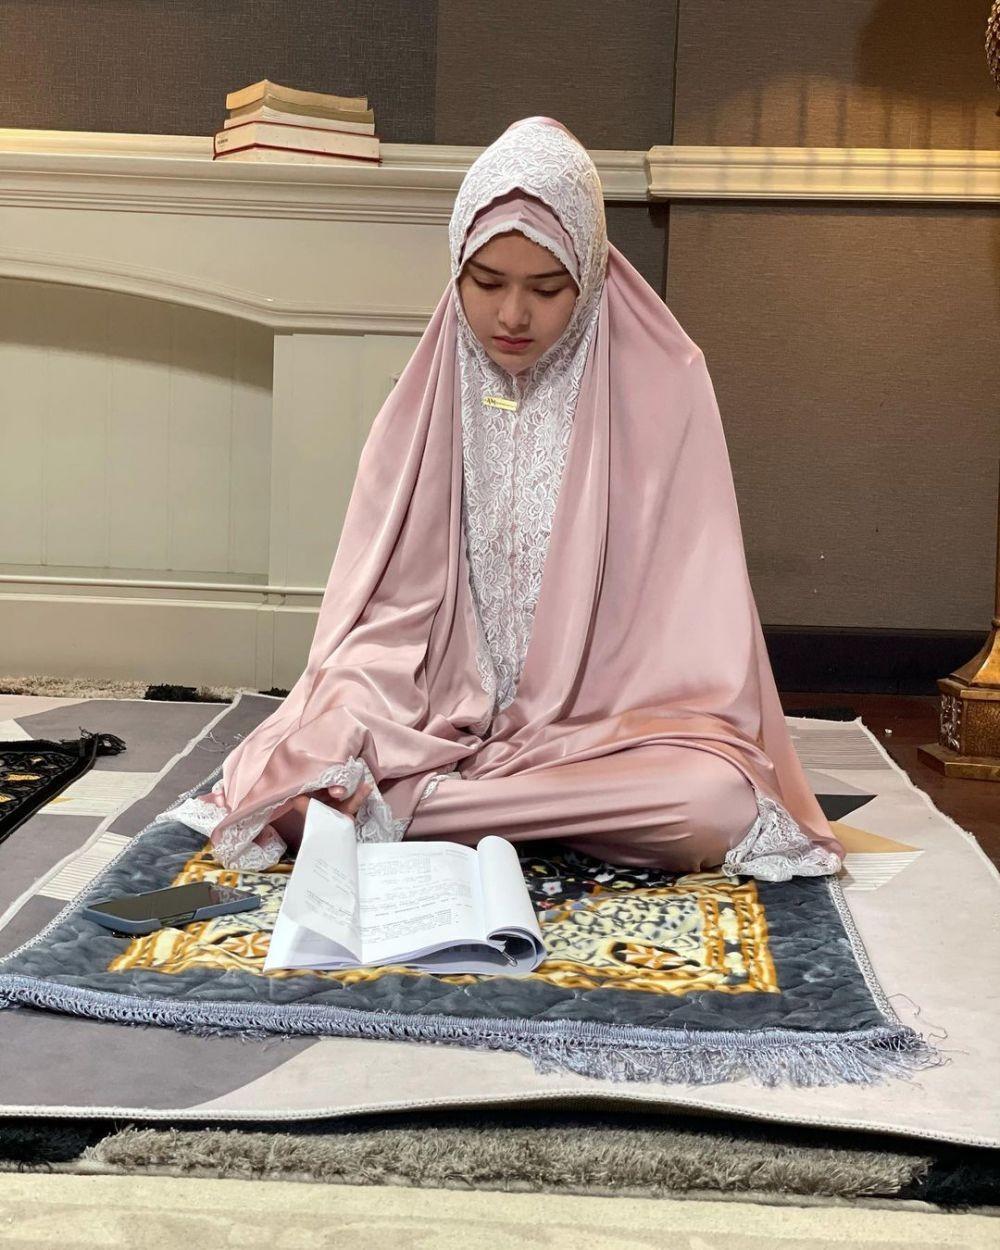 Teduh, 10 Adu Pesona Amanda Manopo Vs Glenca Chysara saat Pakai Hijab